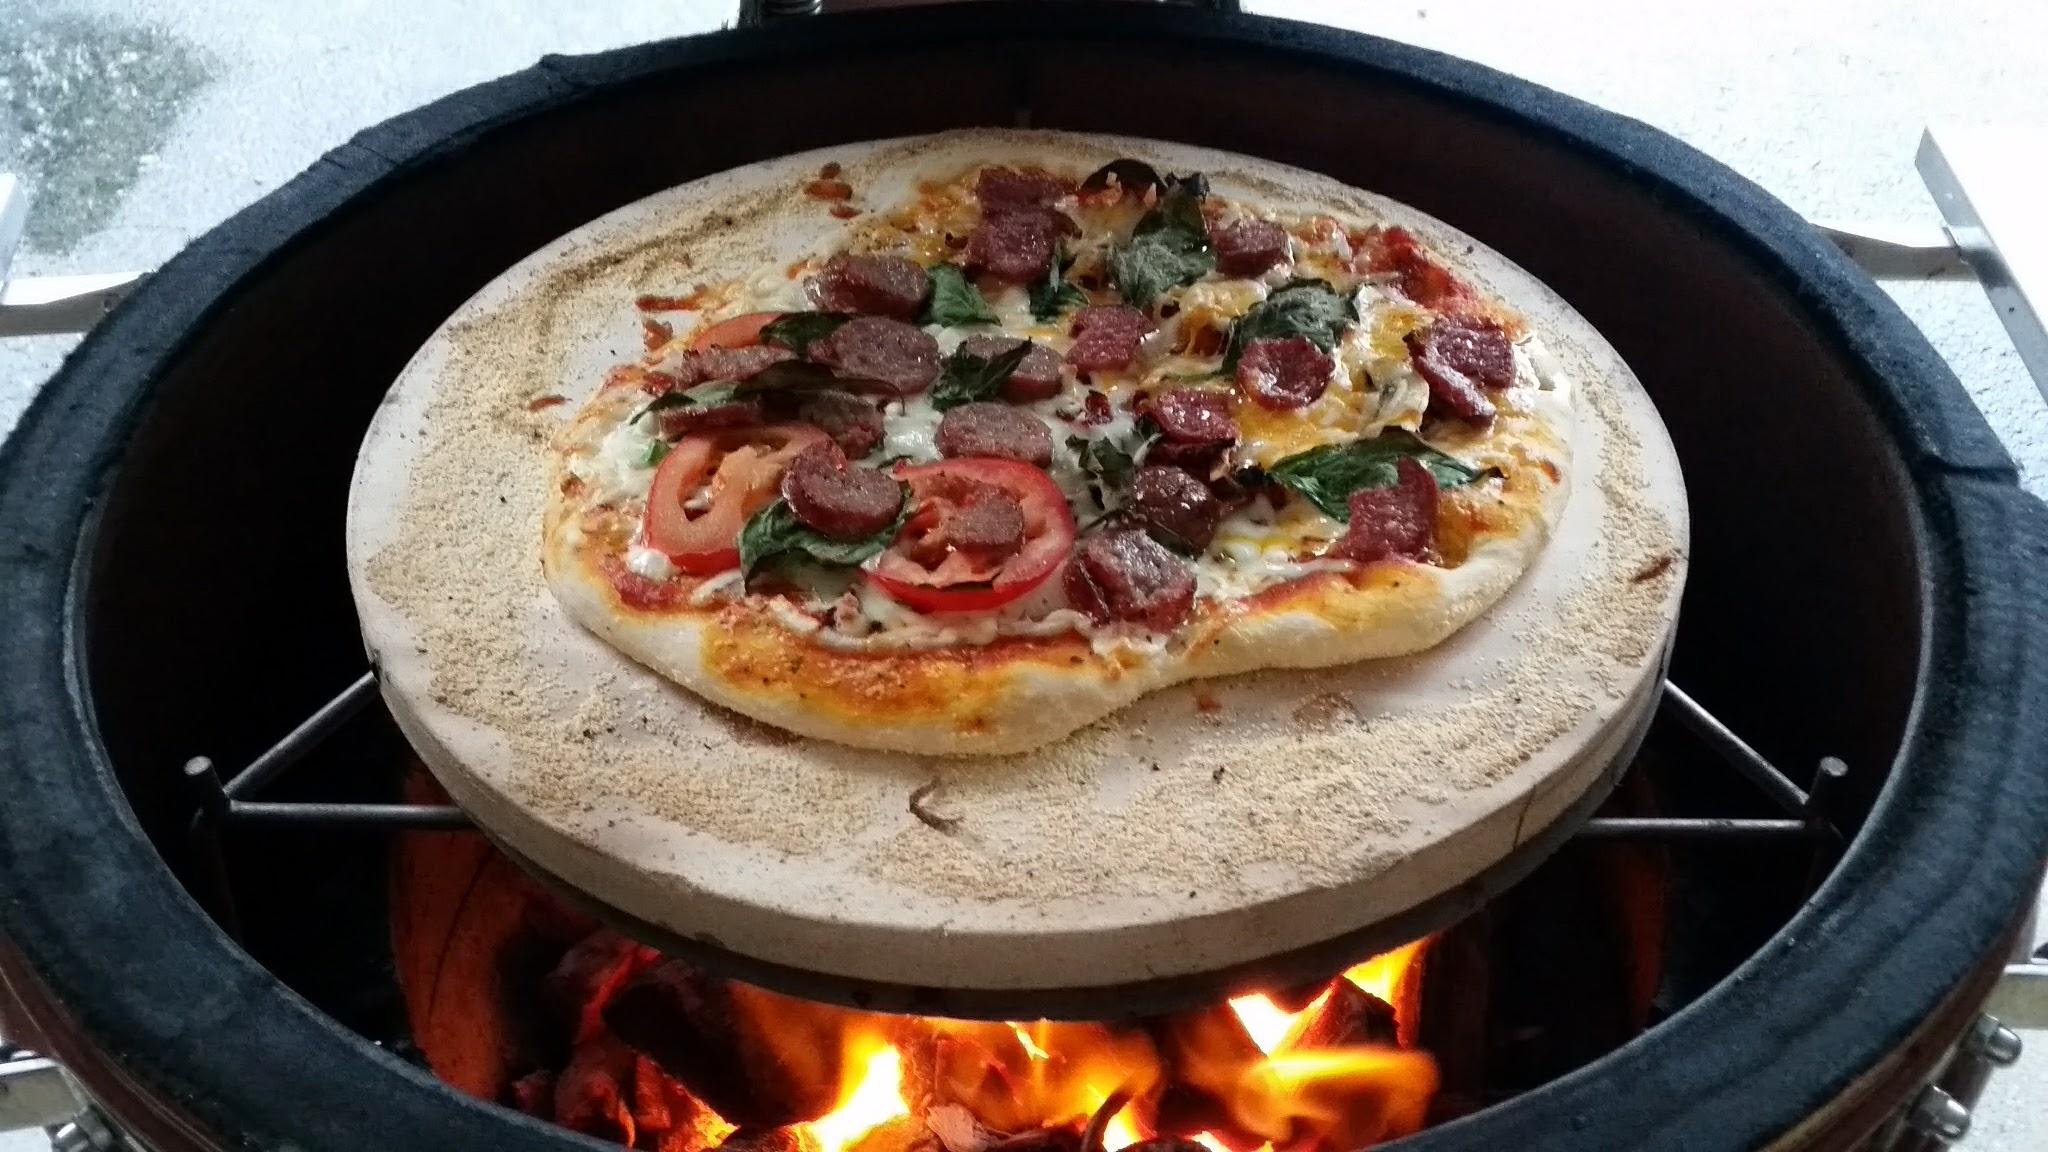 Homemade Sausage, Tomato, and Oregano Pizza, Cooking on a Kamado